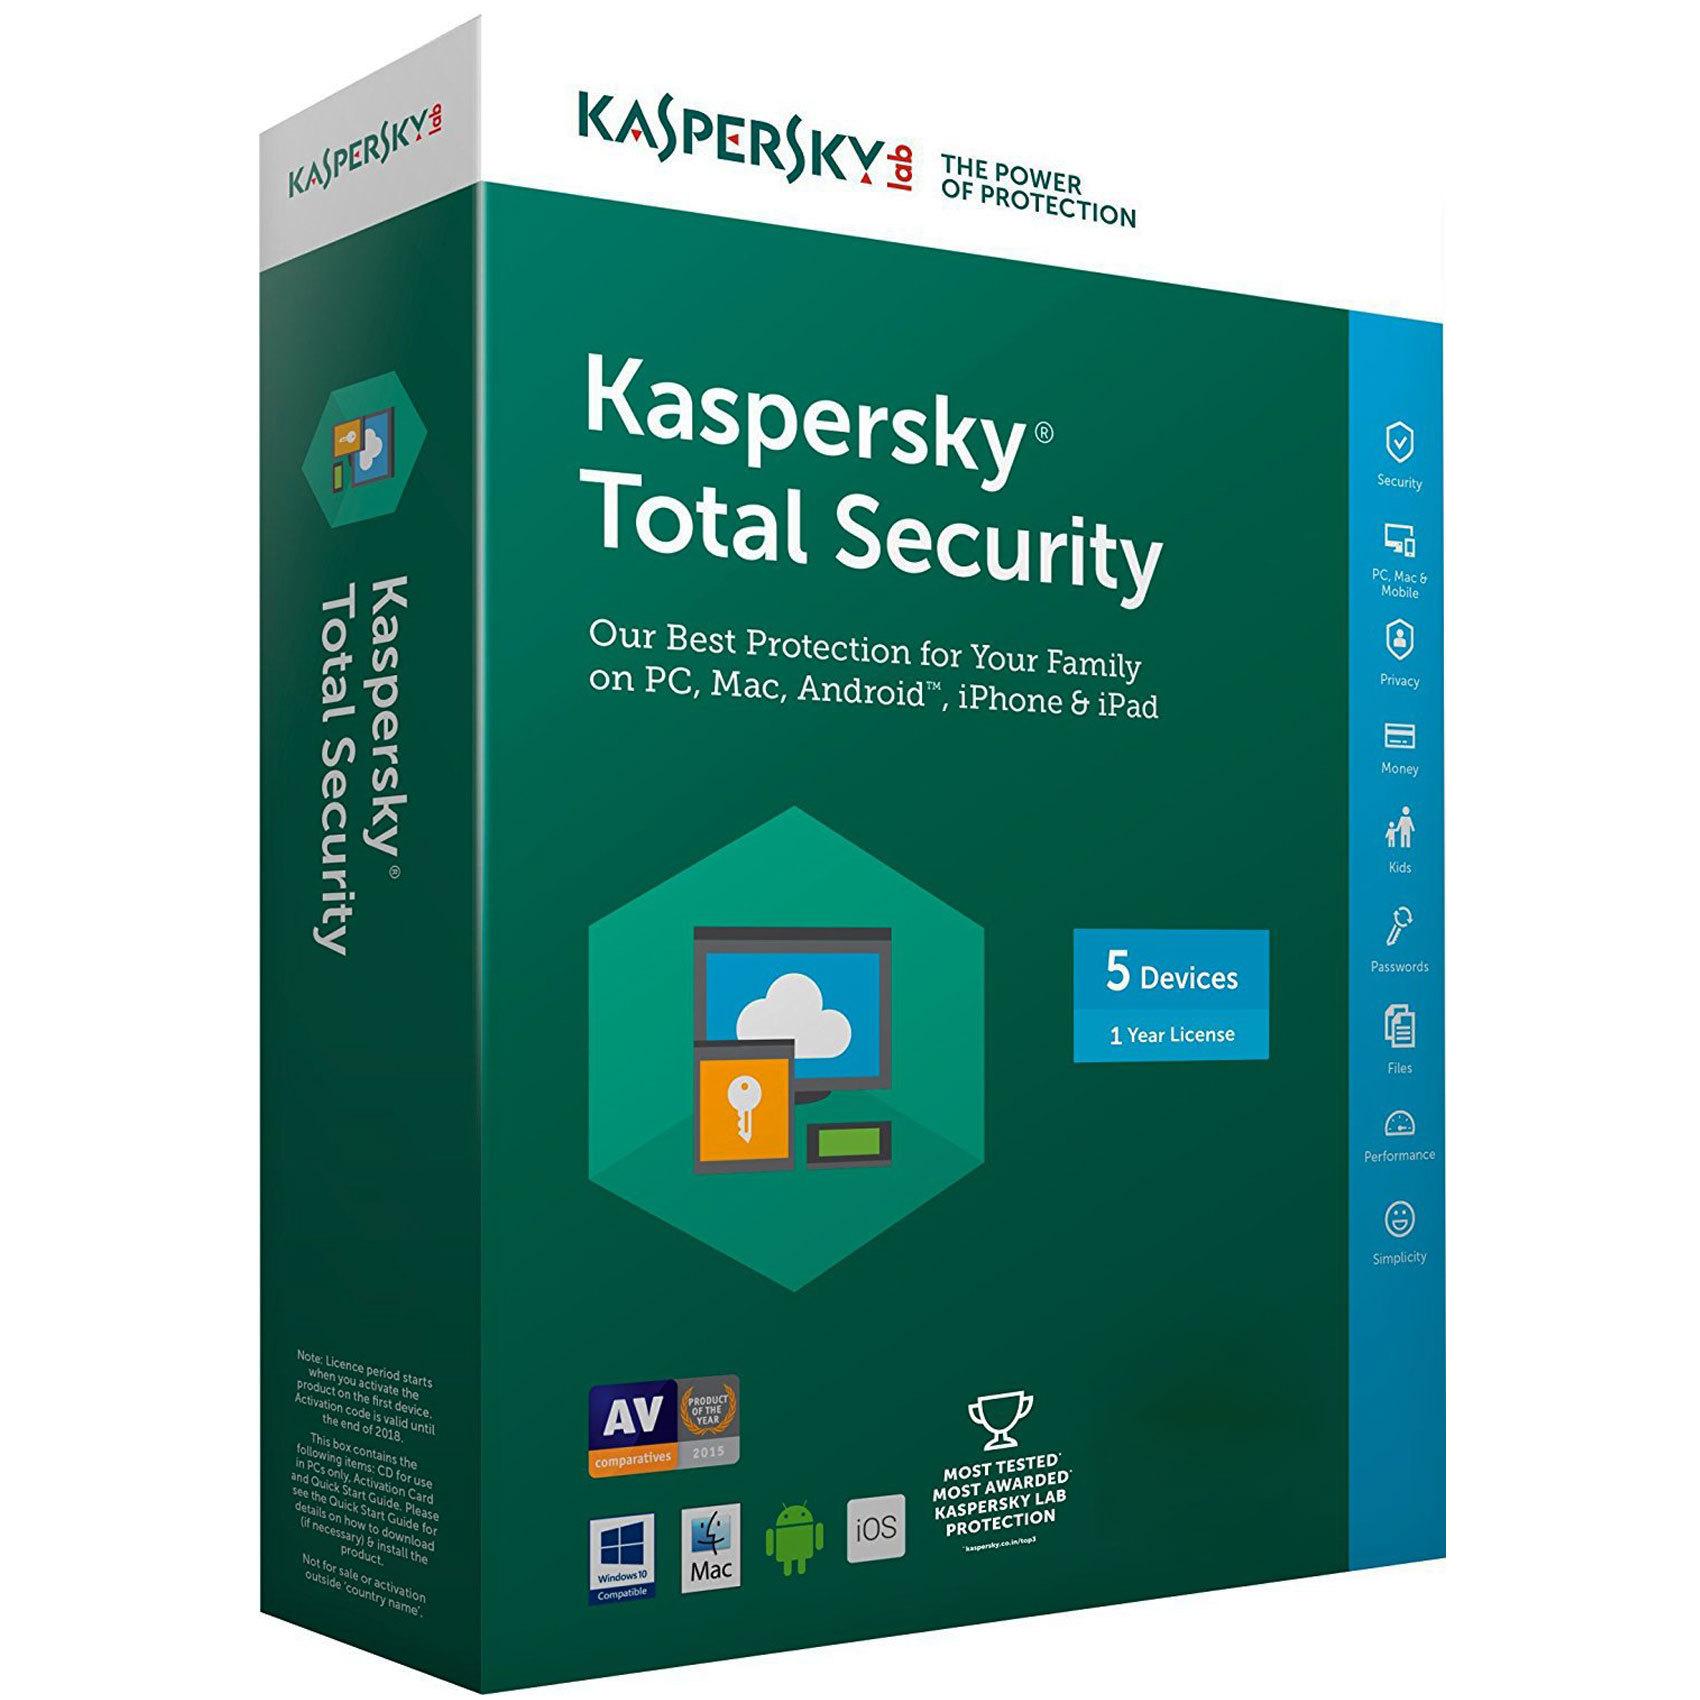 Kaspersky Total Security 2018 Activation Code